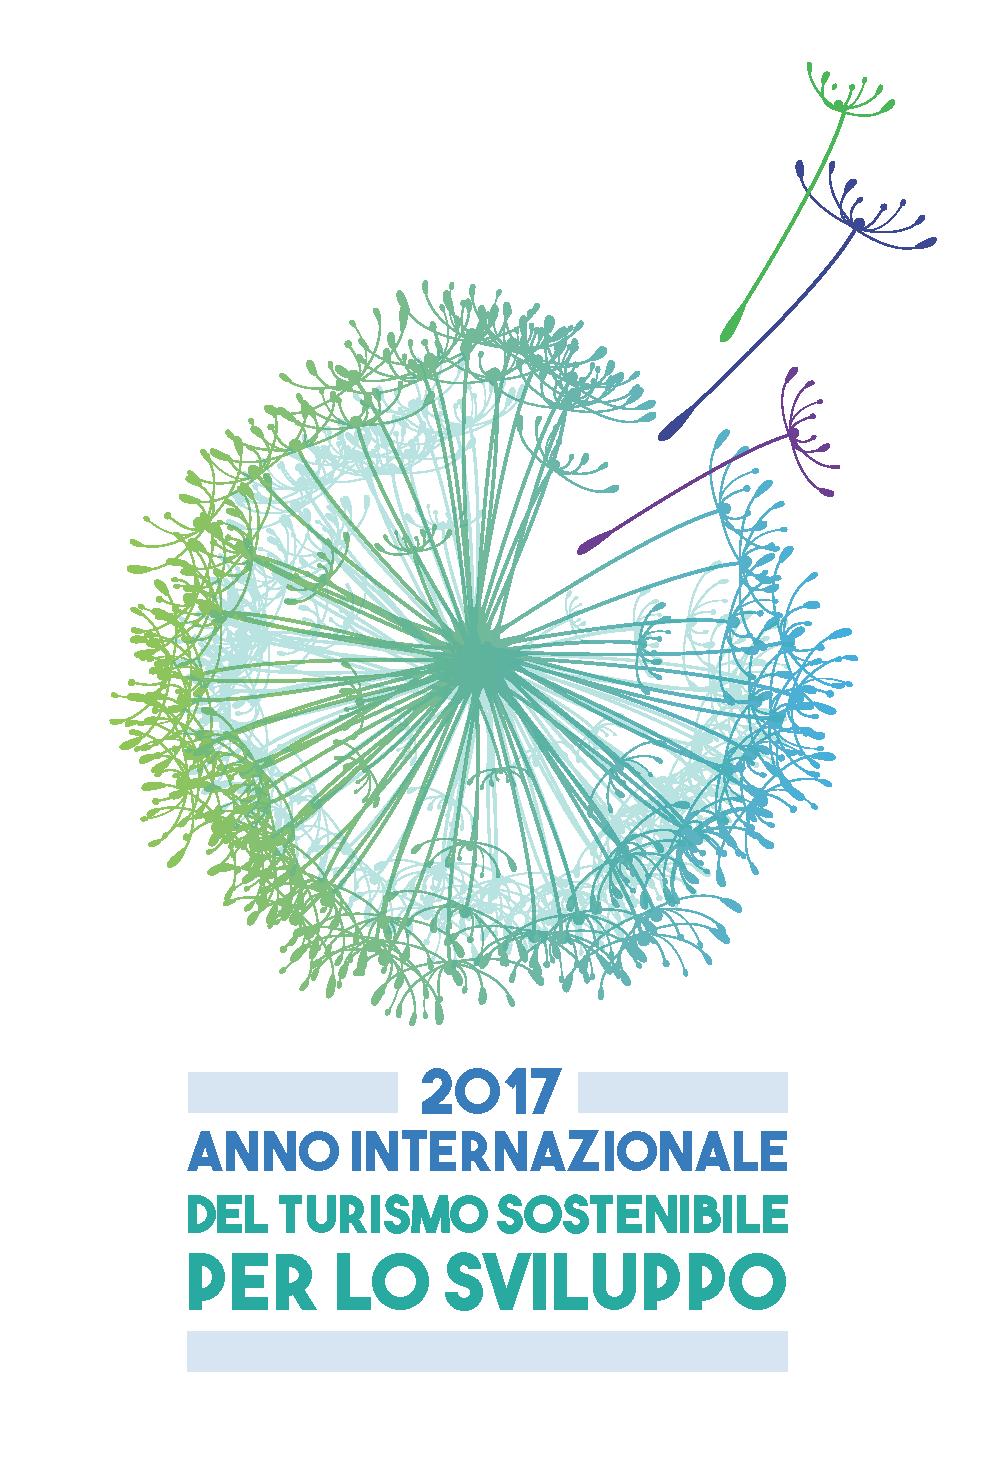 logo_italian_vertical